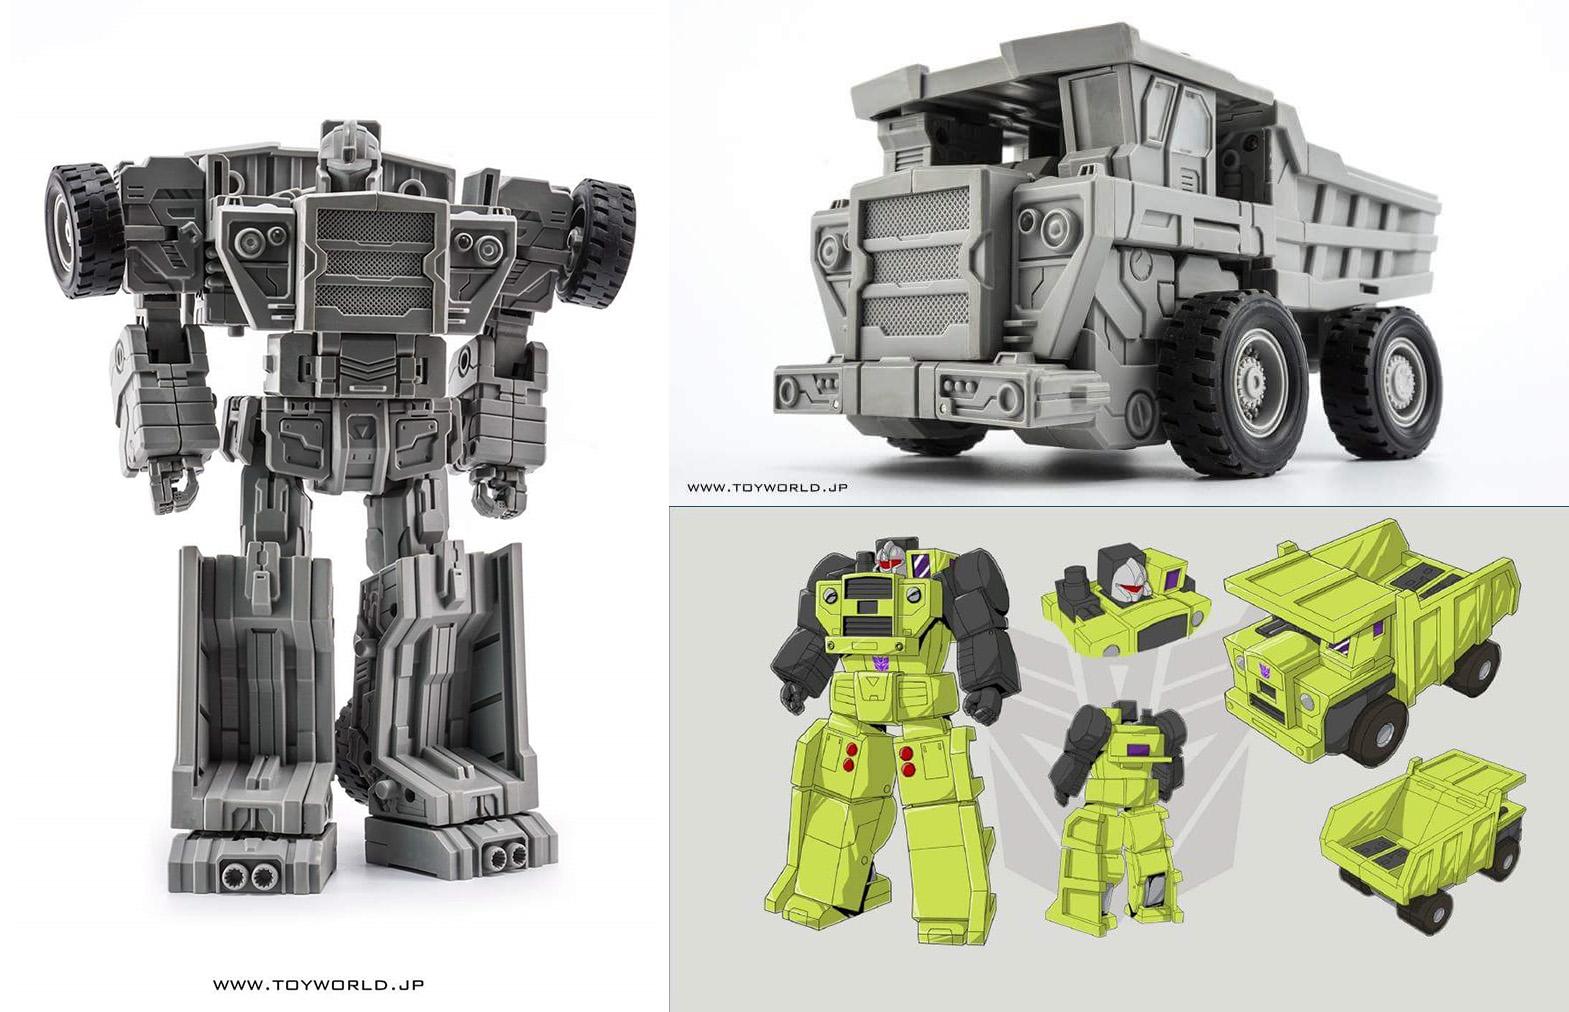 [Toyworld] Produit Tiers - Jouet TW-C Constructor aka Devastator/Dévastateur (Version vert G1 et jaune G2) - Page 2 MDvzf8RQ